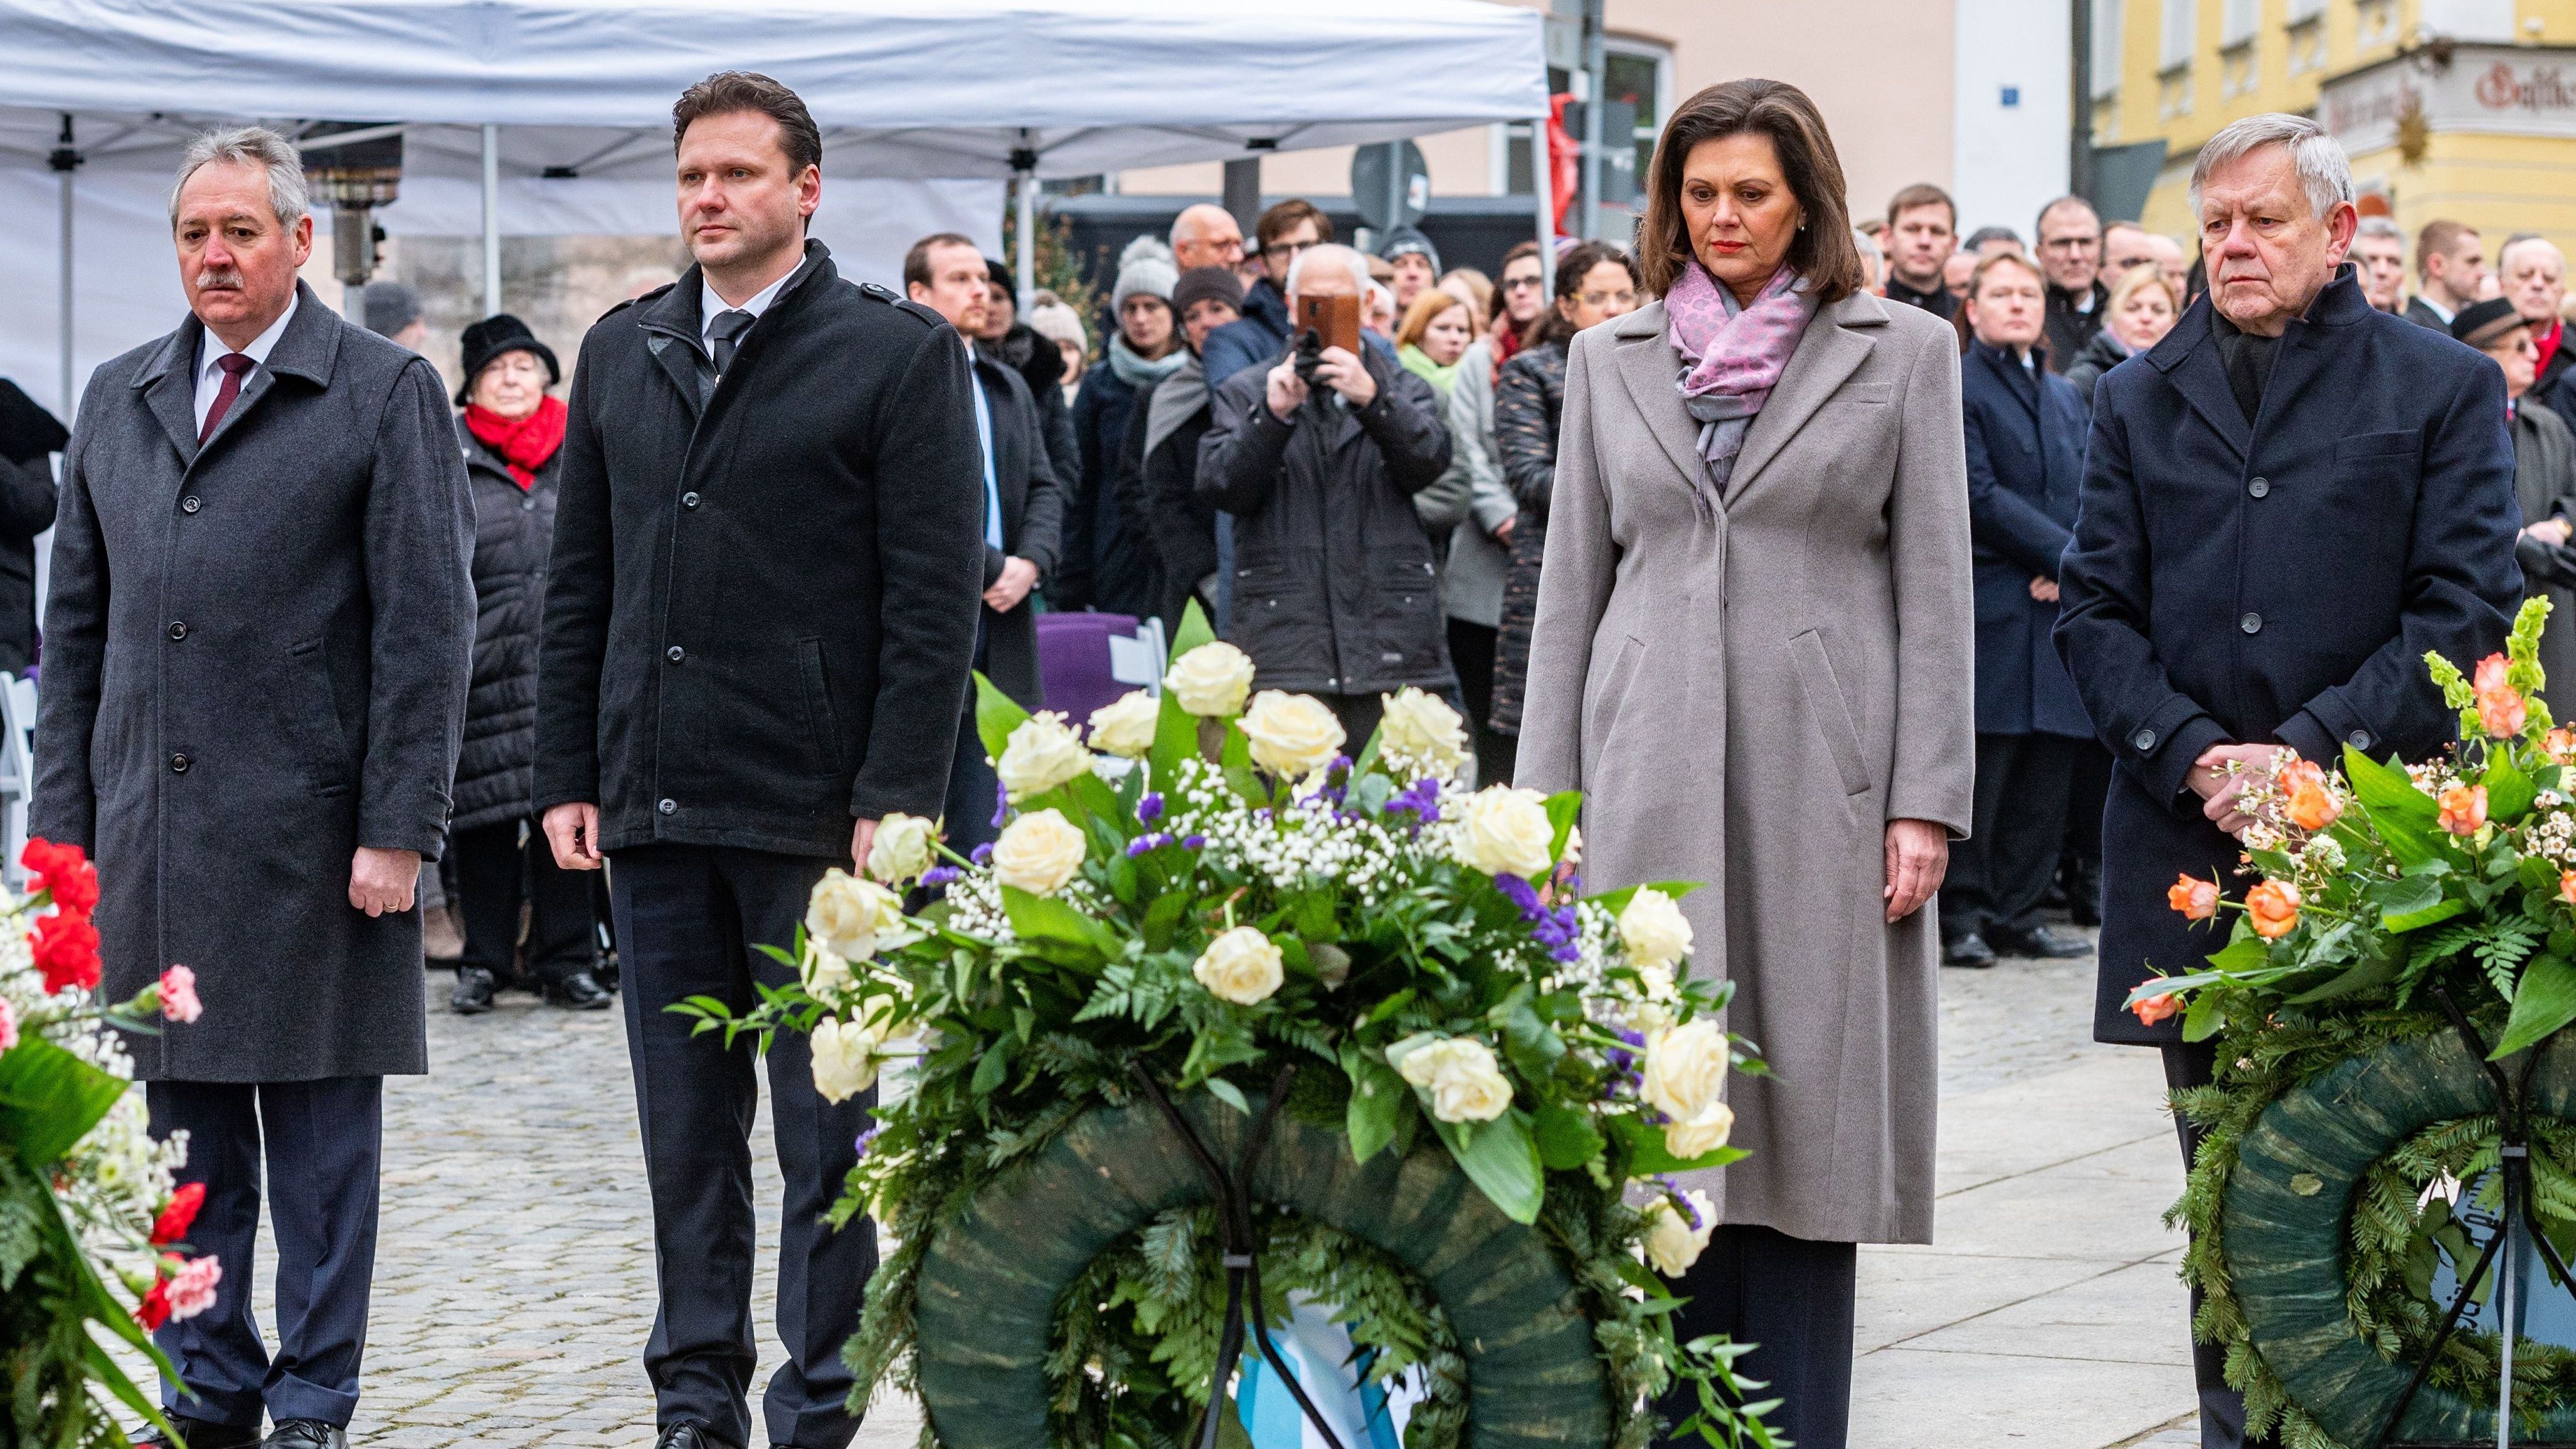 Viktor Sigl, (l.-r.), Radek Vondracek, Ilse Aigner, Karl Freller am Mahnmal für die Opfer des Nationalsozialismus